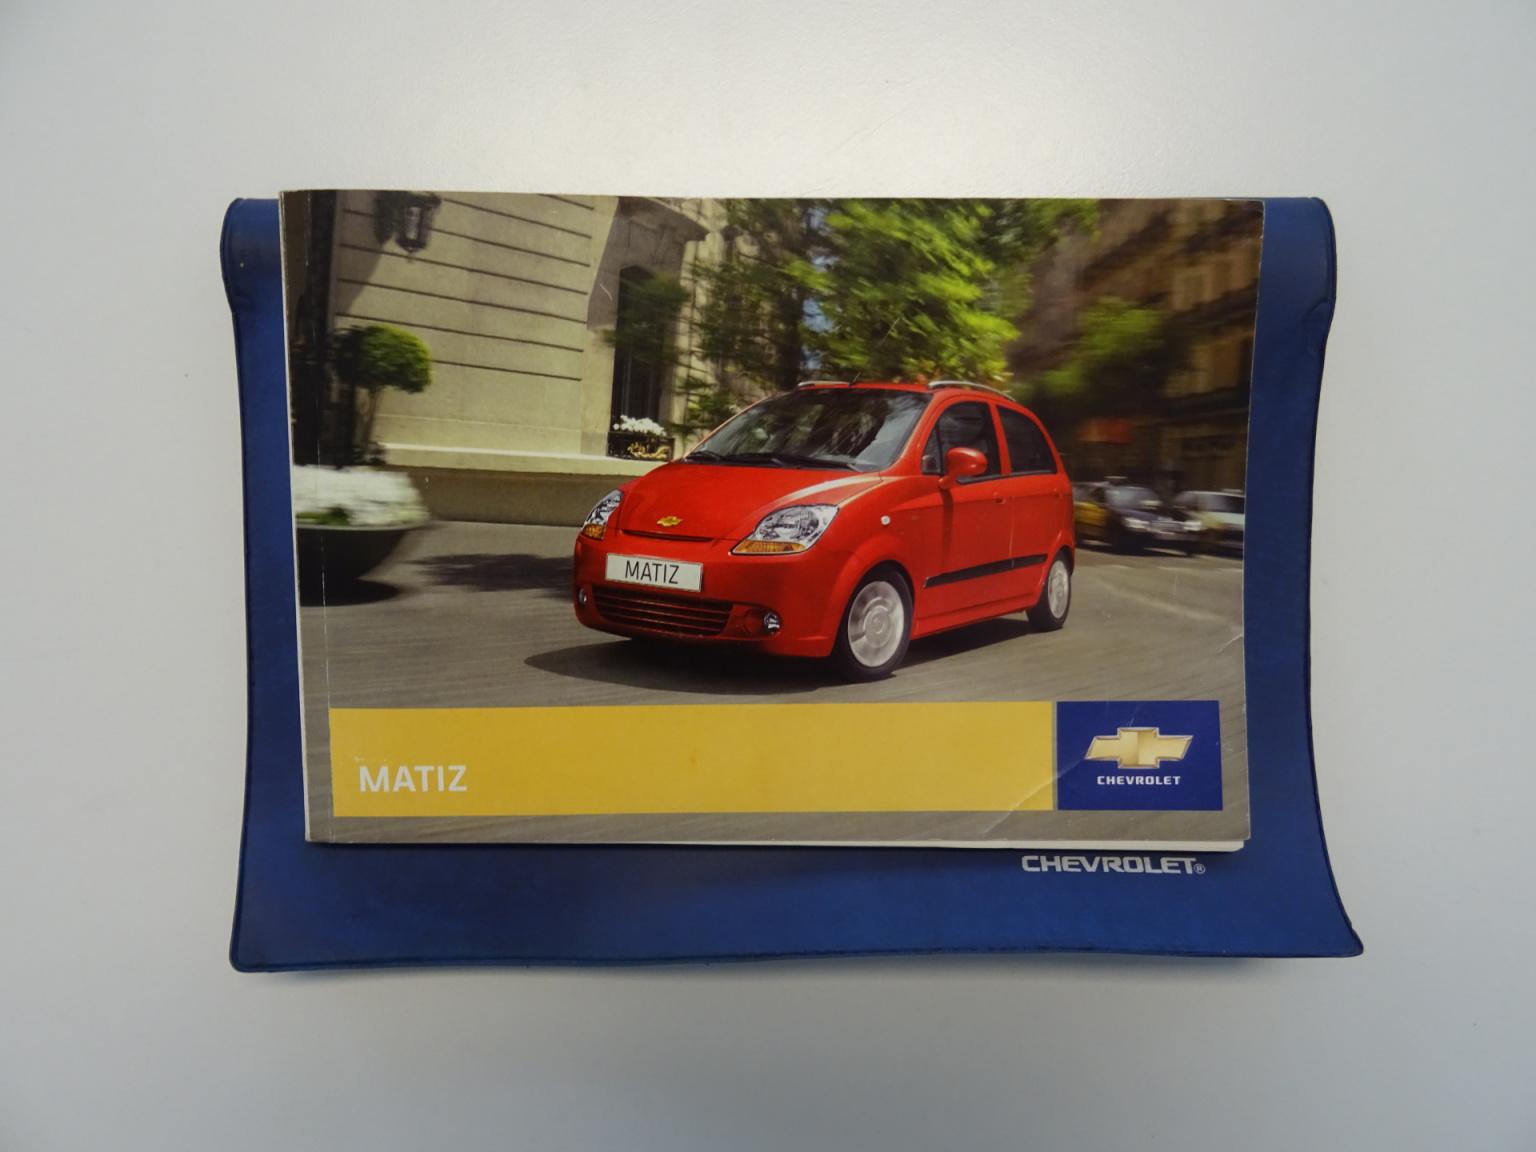 Chevrolet-Matiz-6